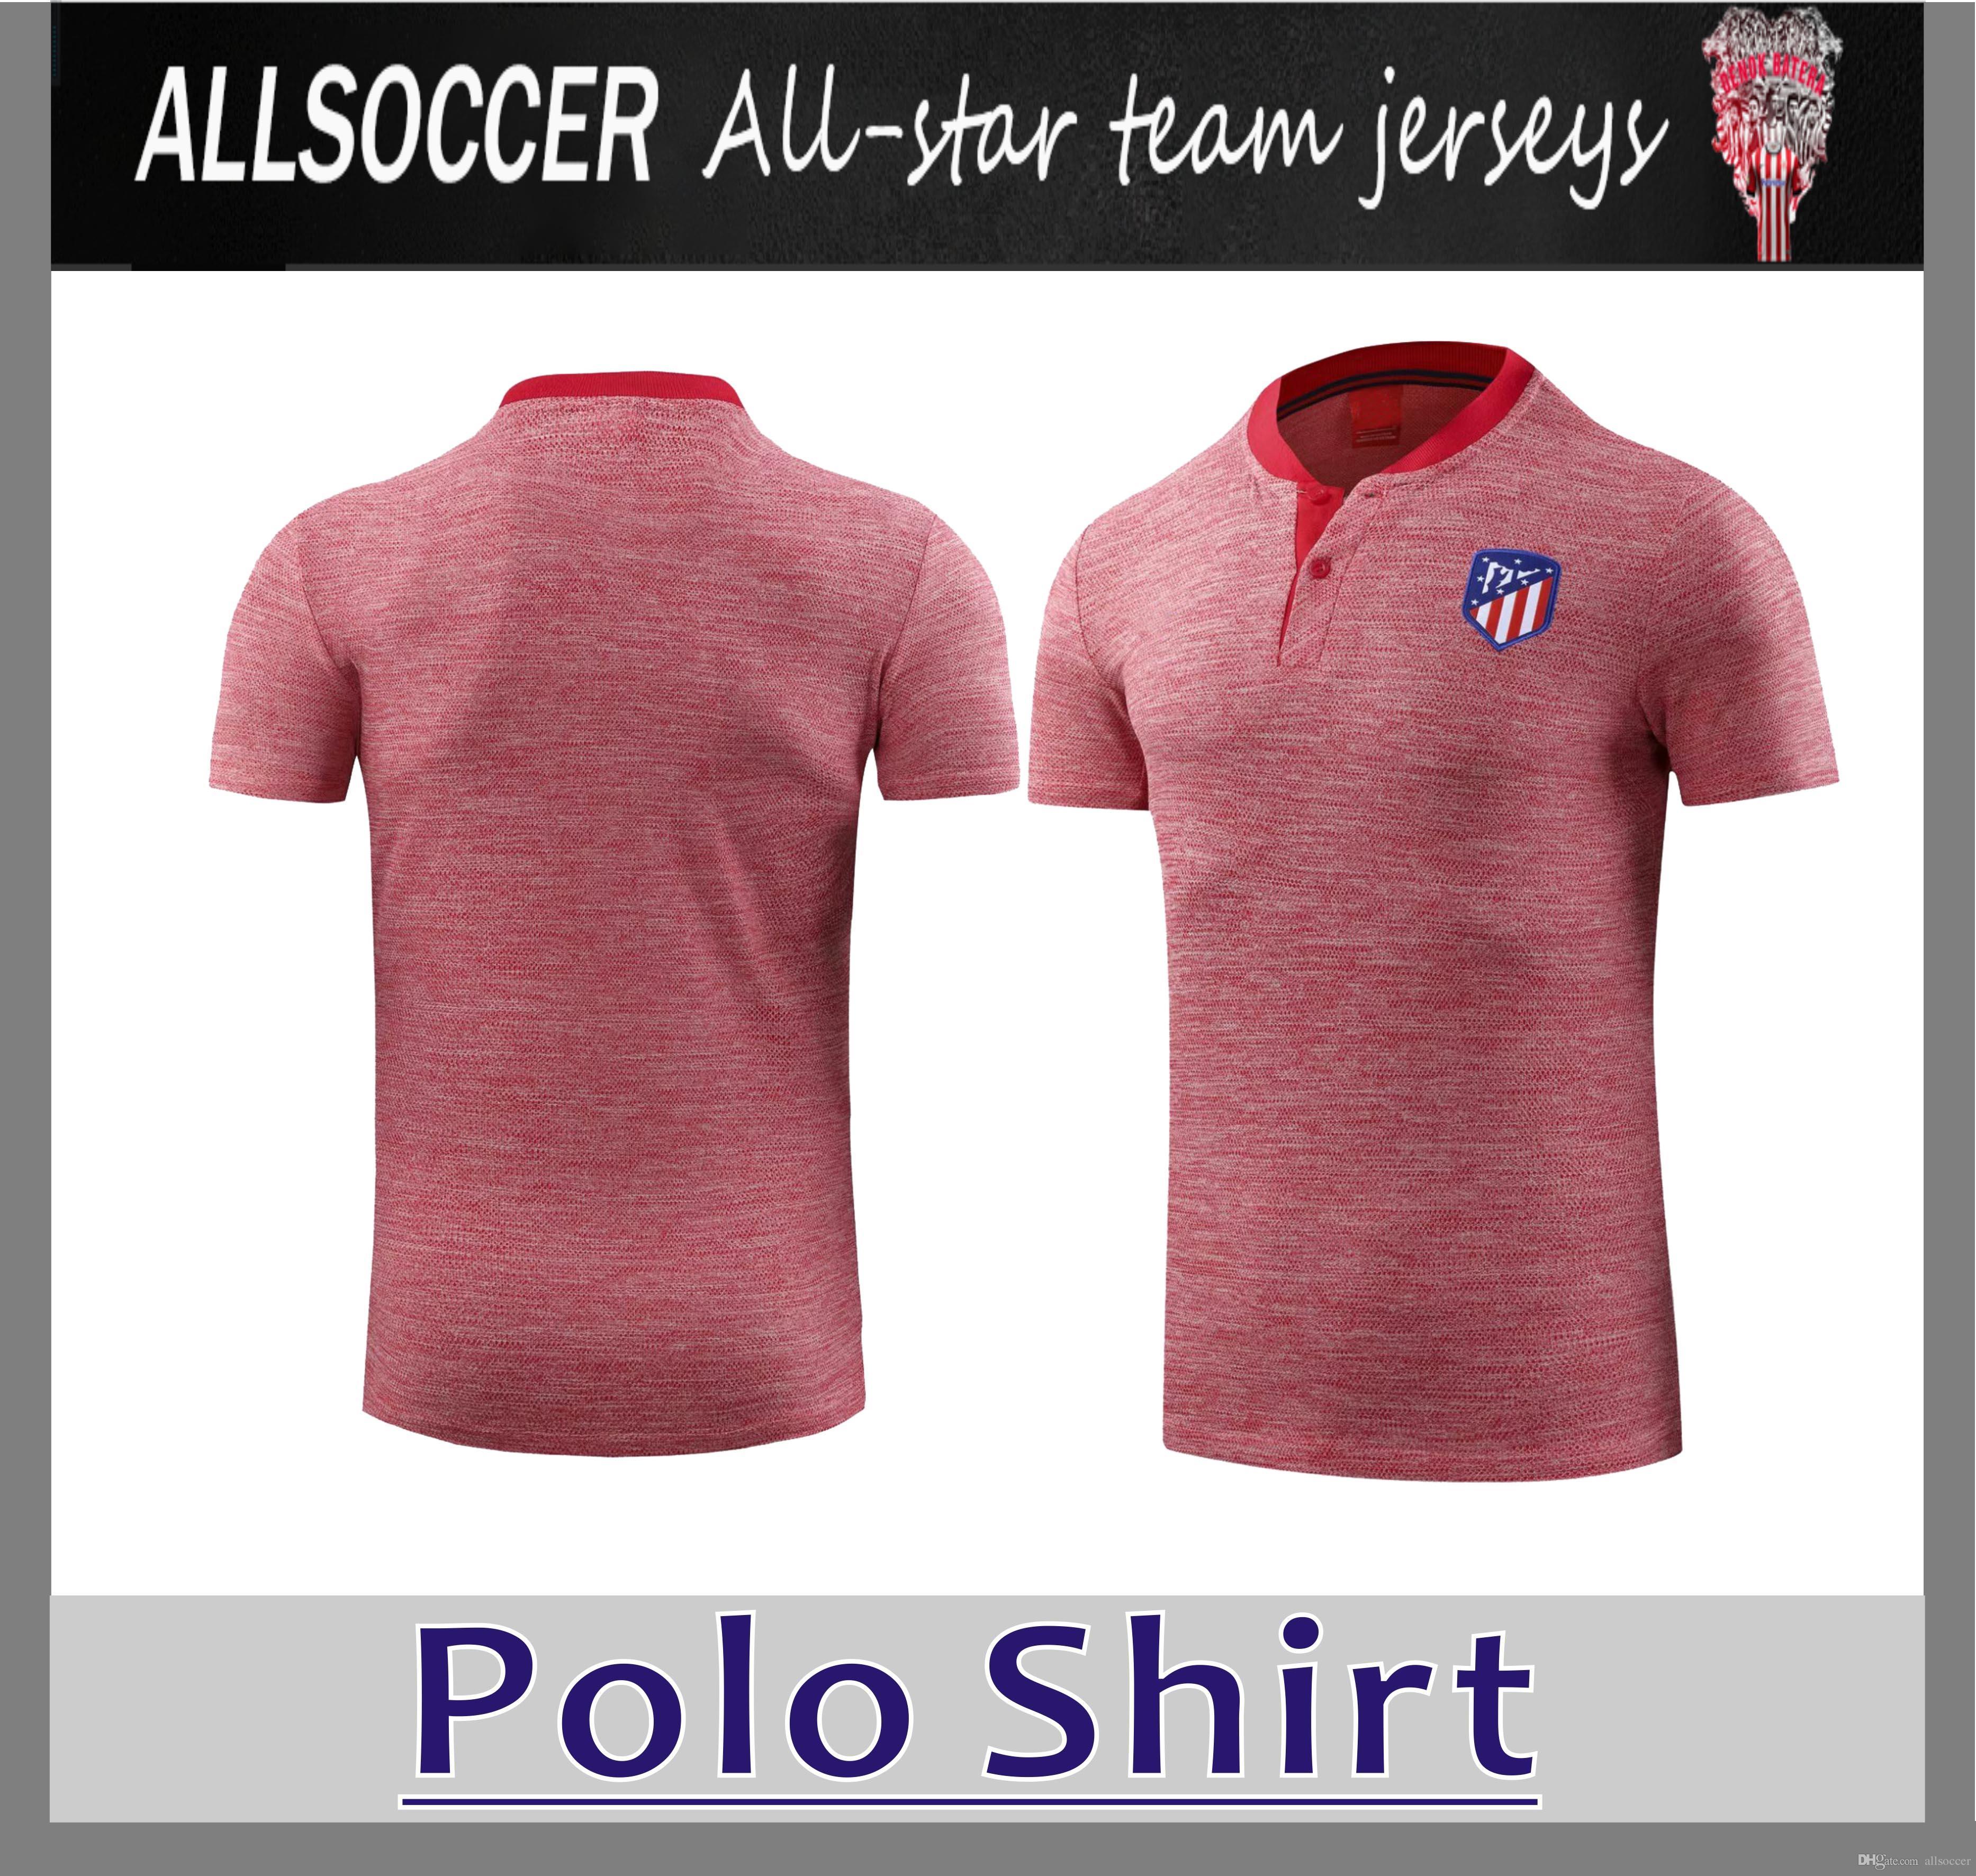 Compre 2019 Atletico Madrids Rosa Camisa Polo 18 19 GRIEZMANN Futebol  Uniformes De Futebol Camisa De Futebol Em SaleAthletic De Allsoccer d81156f18d727